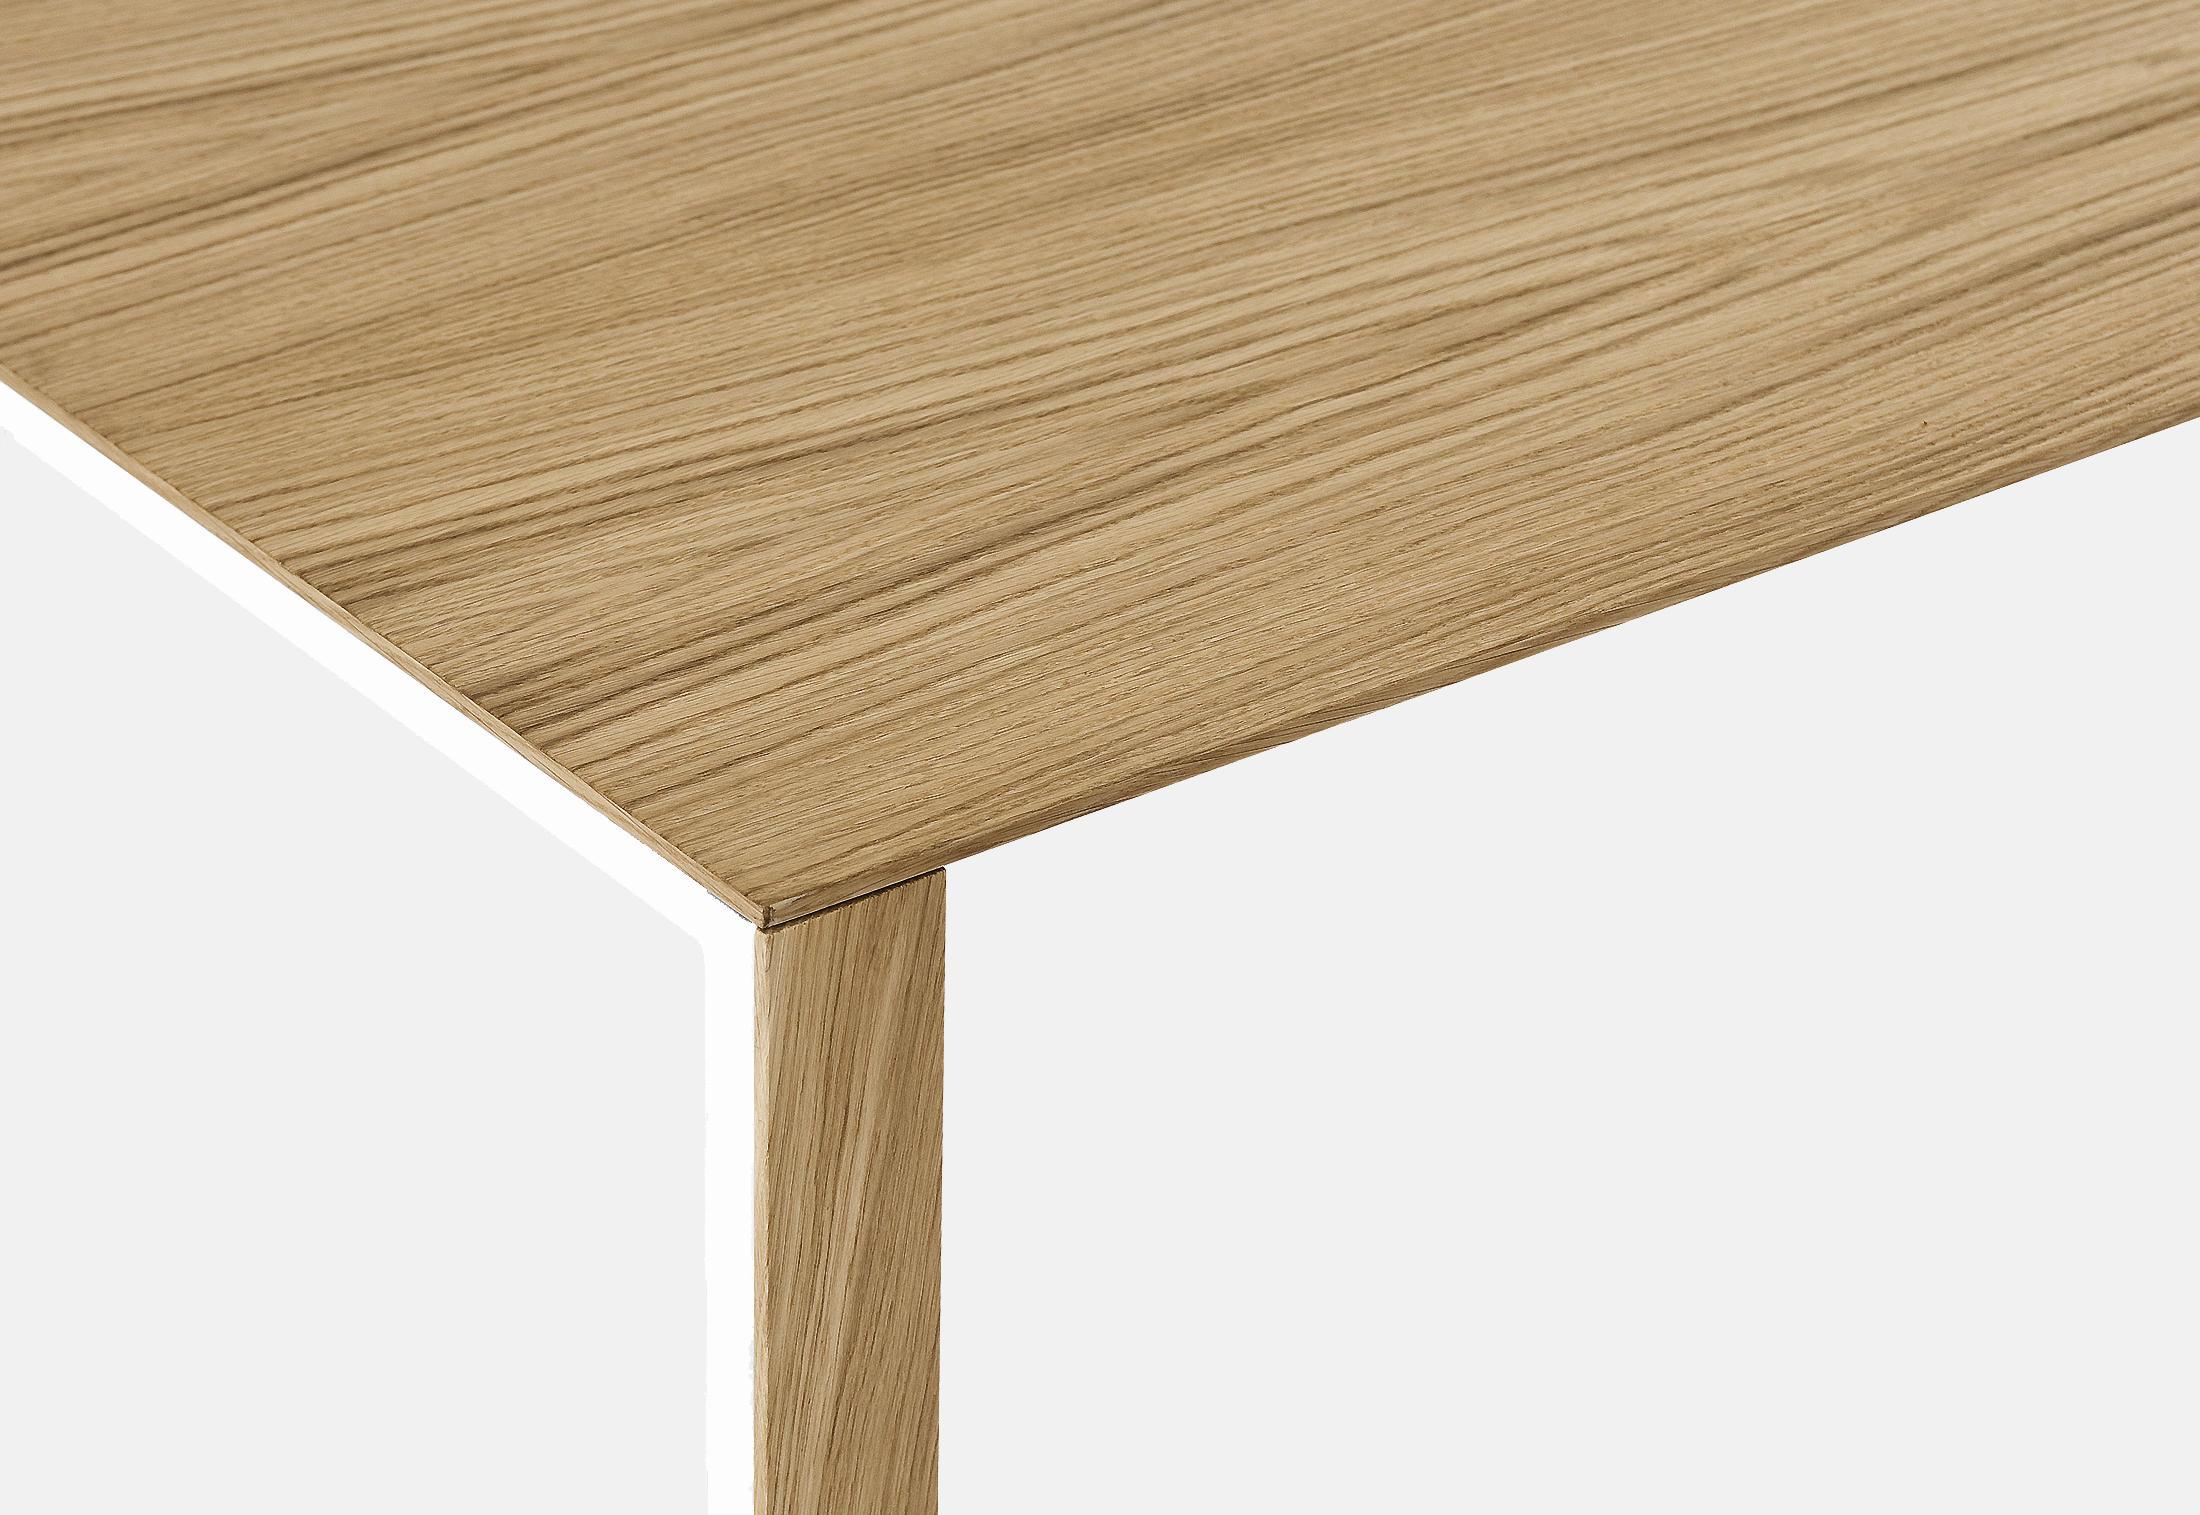 ... Thin K Longo Wood Table By Kristalia | Restaurant Tables ...